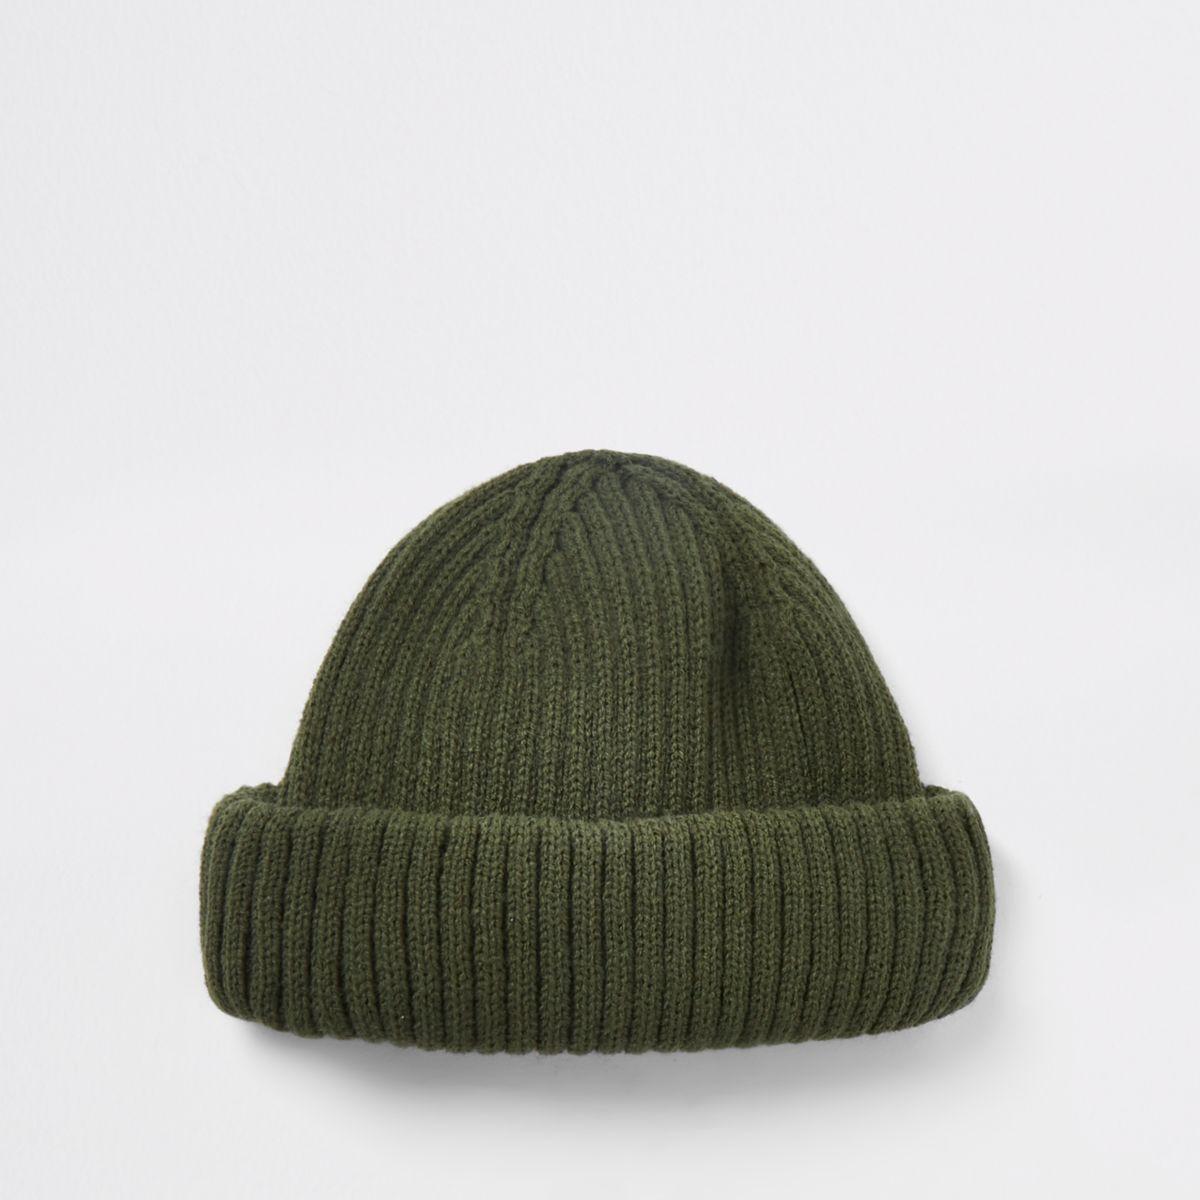 583c4131f96a3 Khaki green fisherman beanie hat - Hats   Caps - Accessories - men